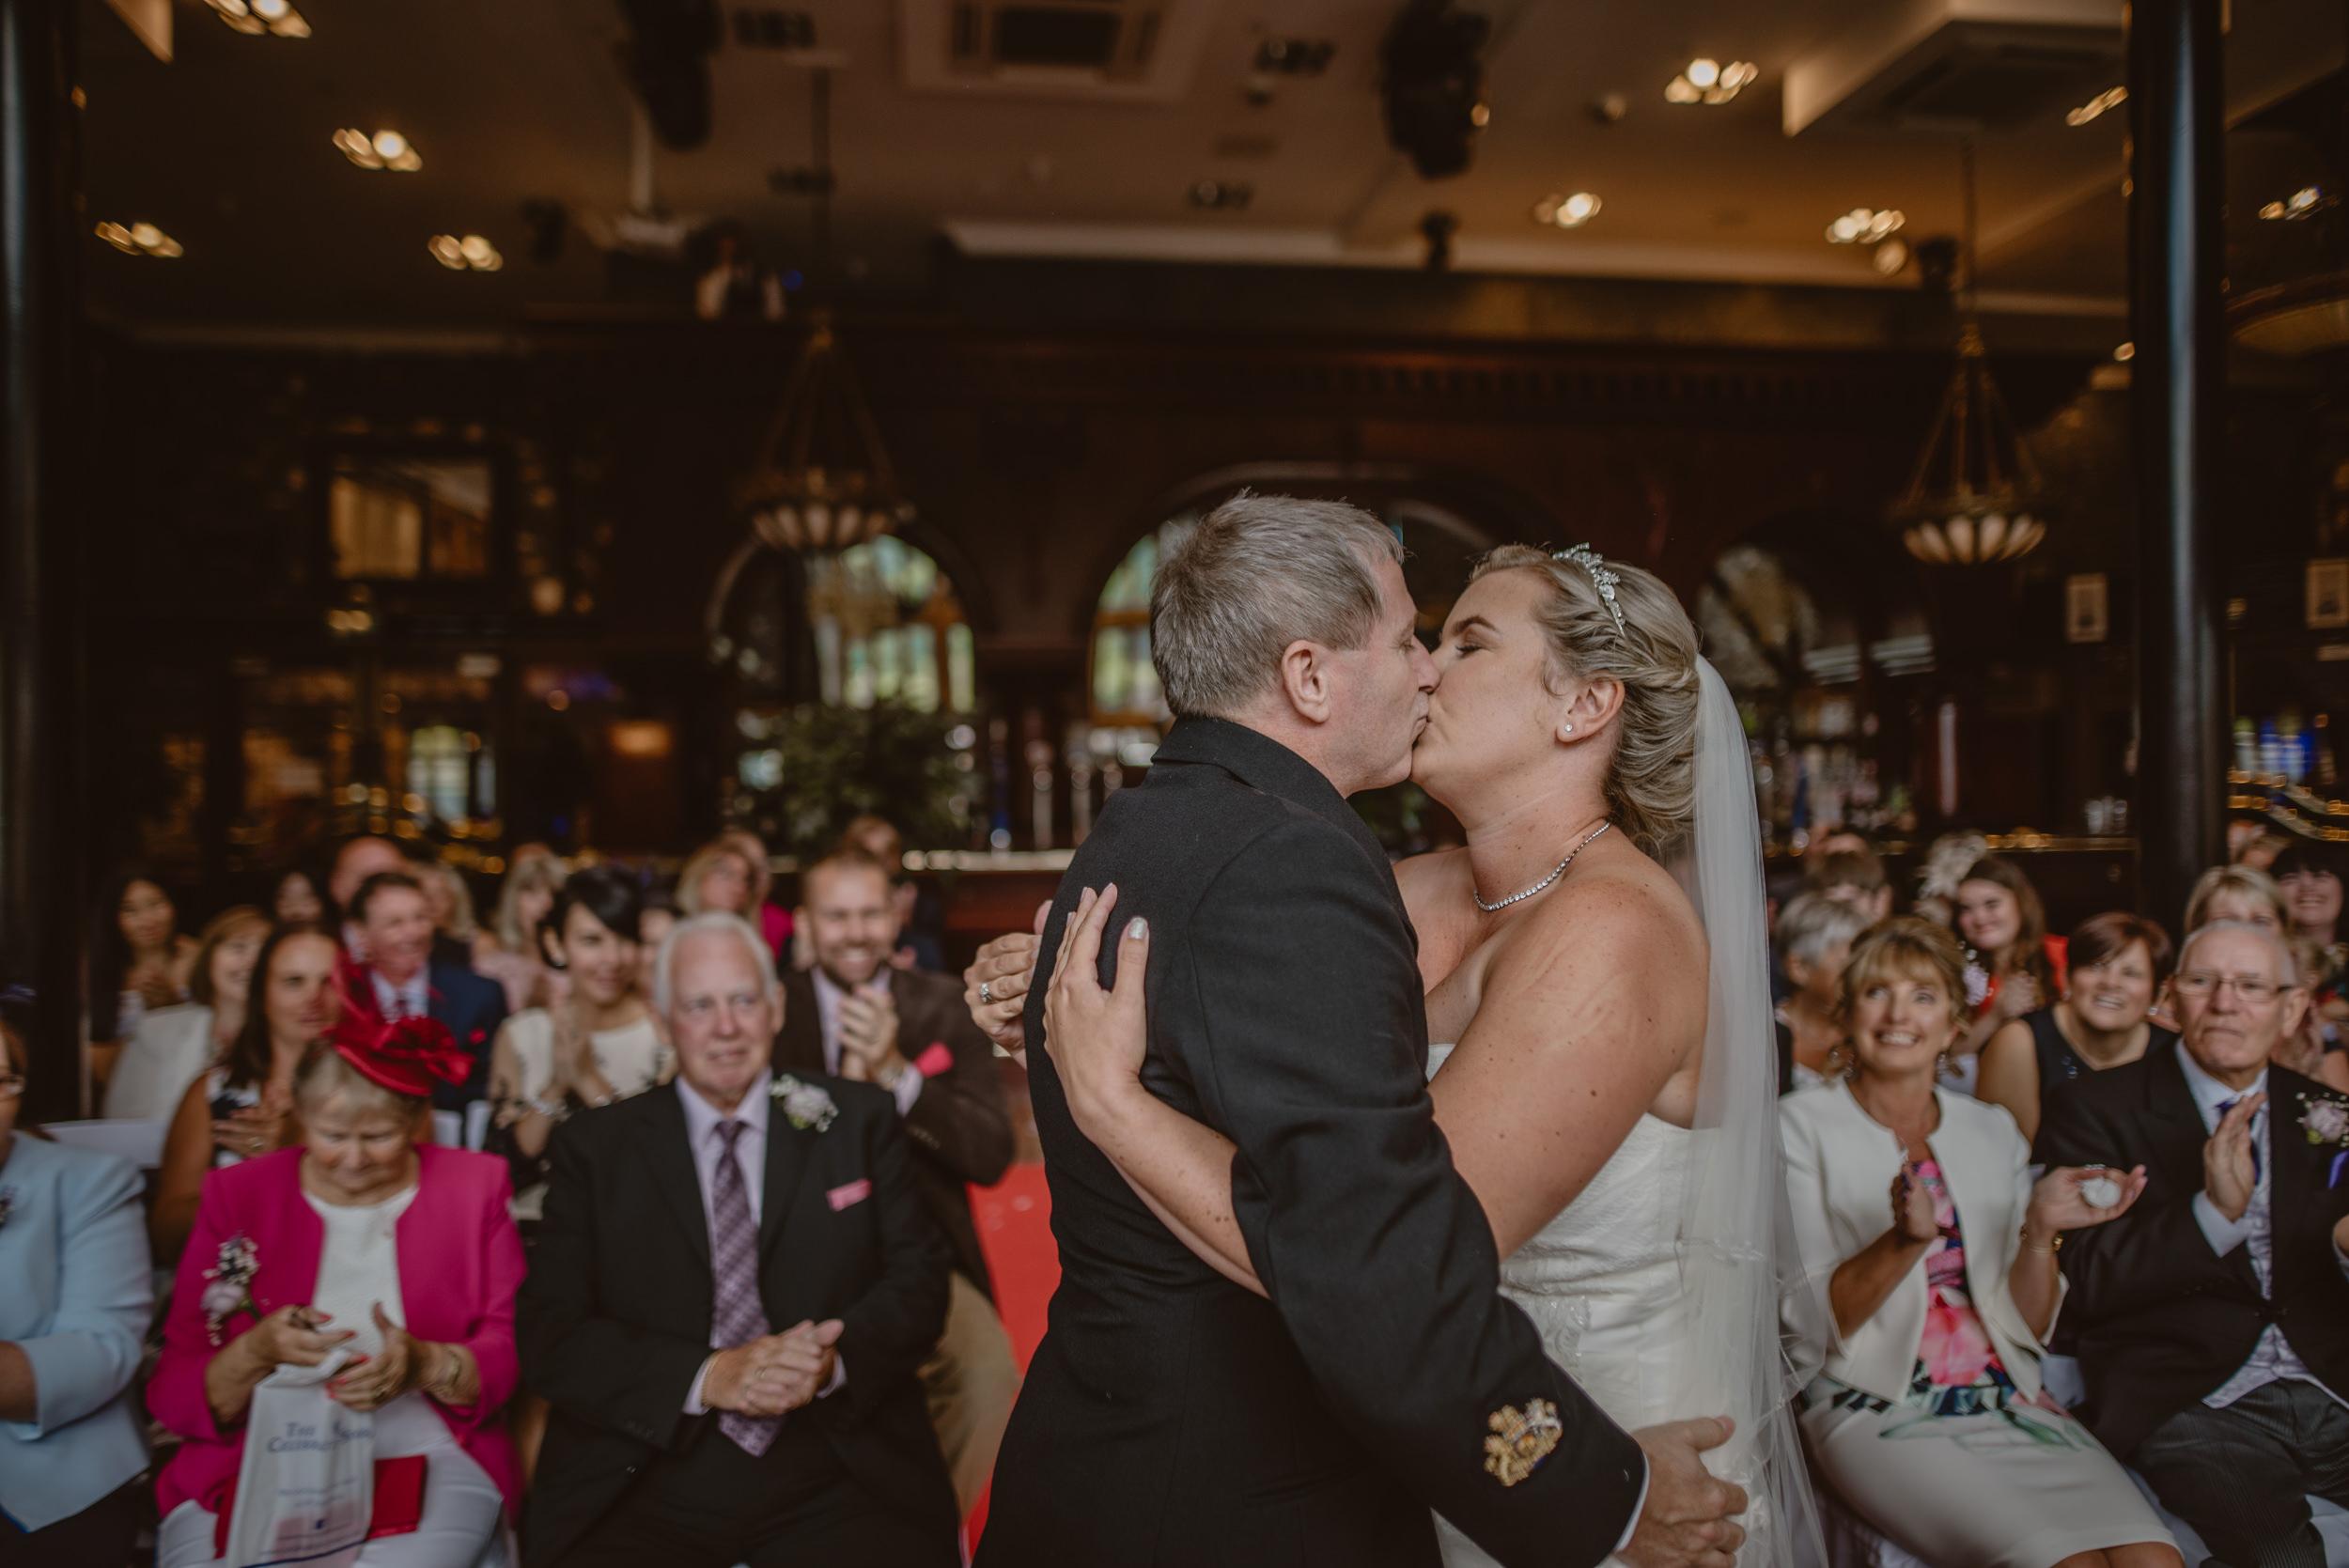 Chantelle-and-Stephen-Old-Thorns-Hotel-Wedding-Liphook-Manu-Mendoza-Wedding-Photography-232.jpg